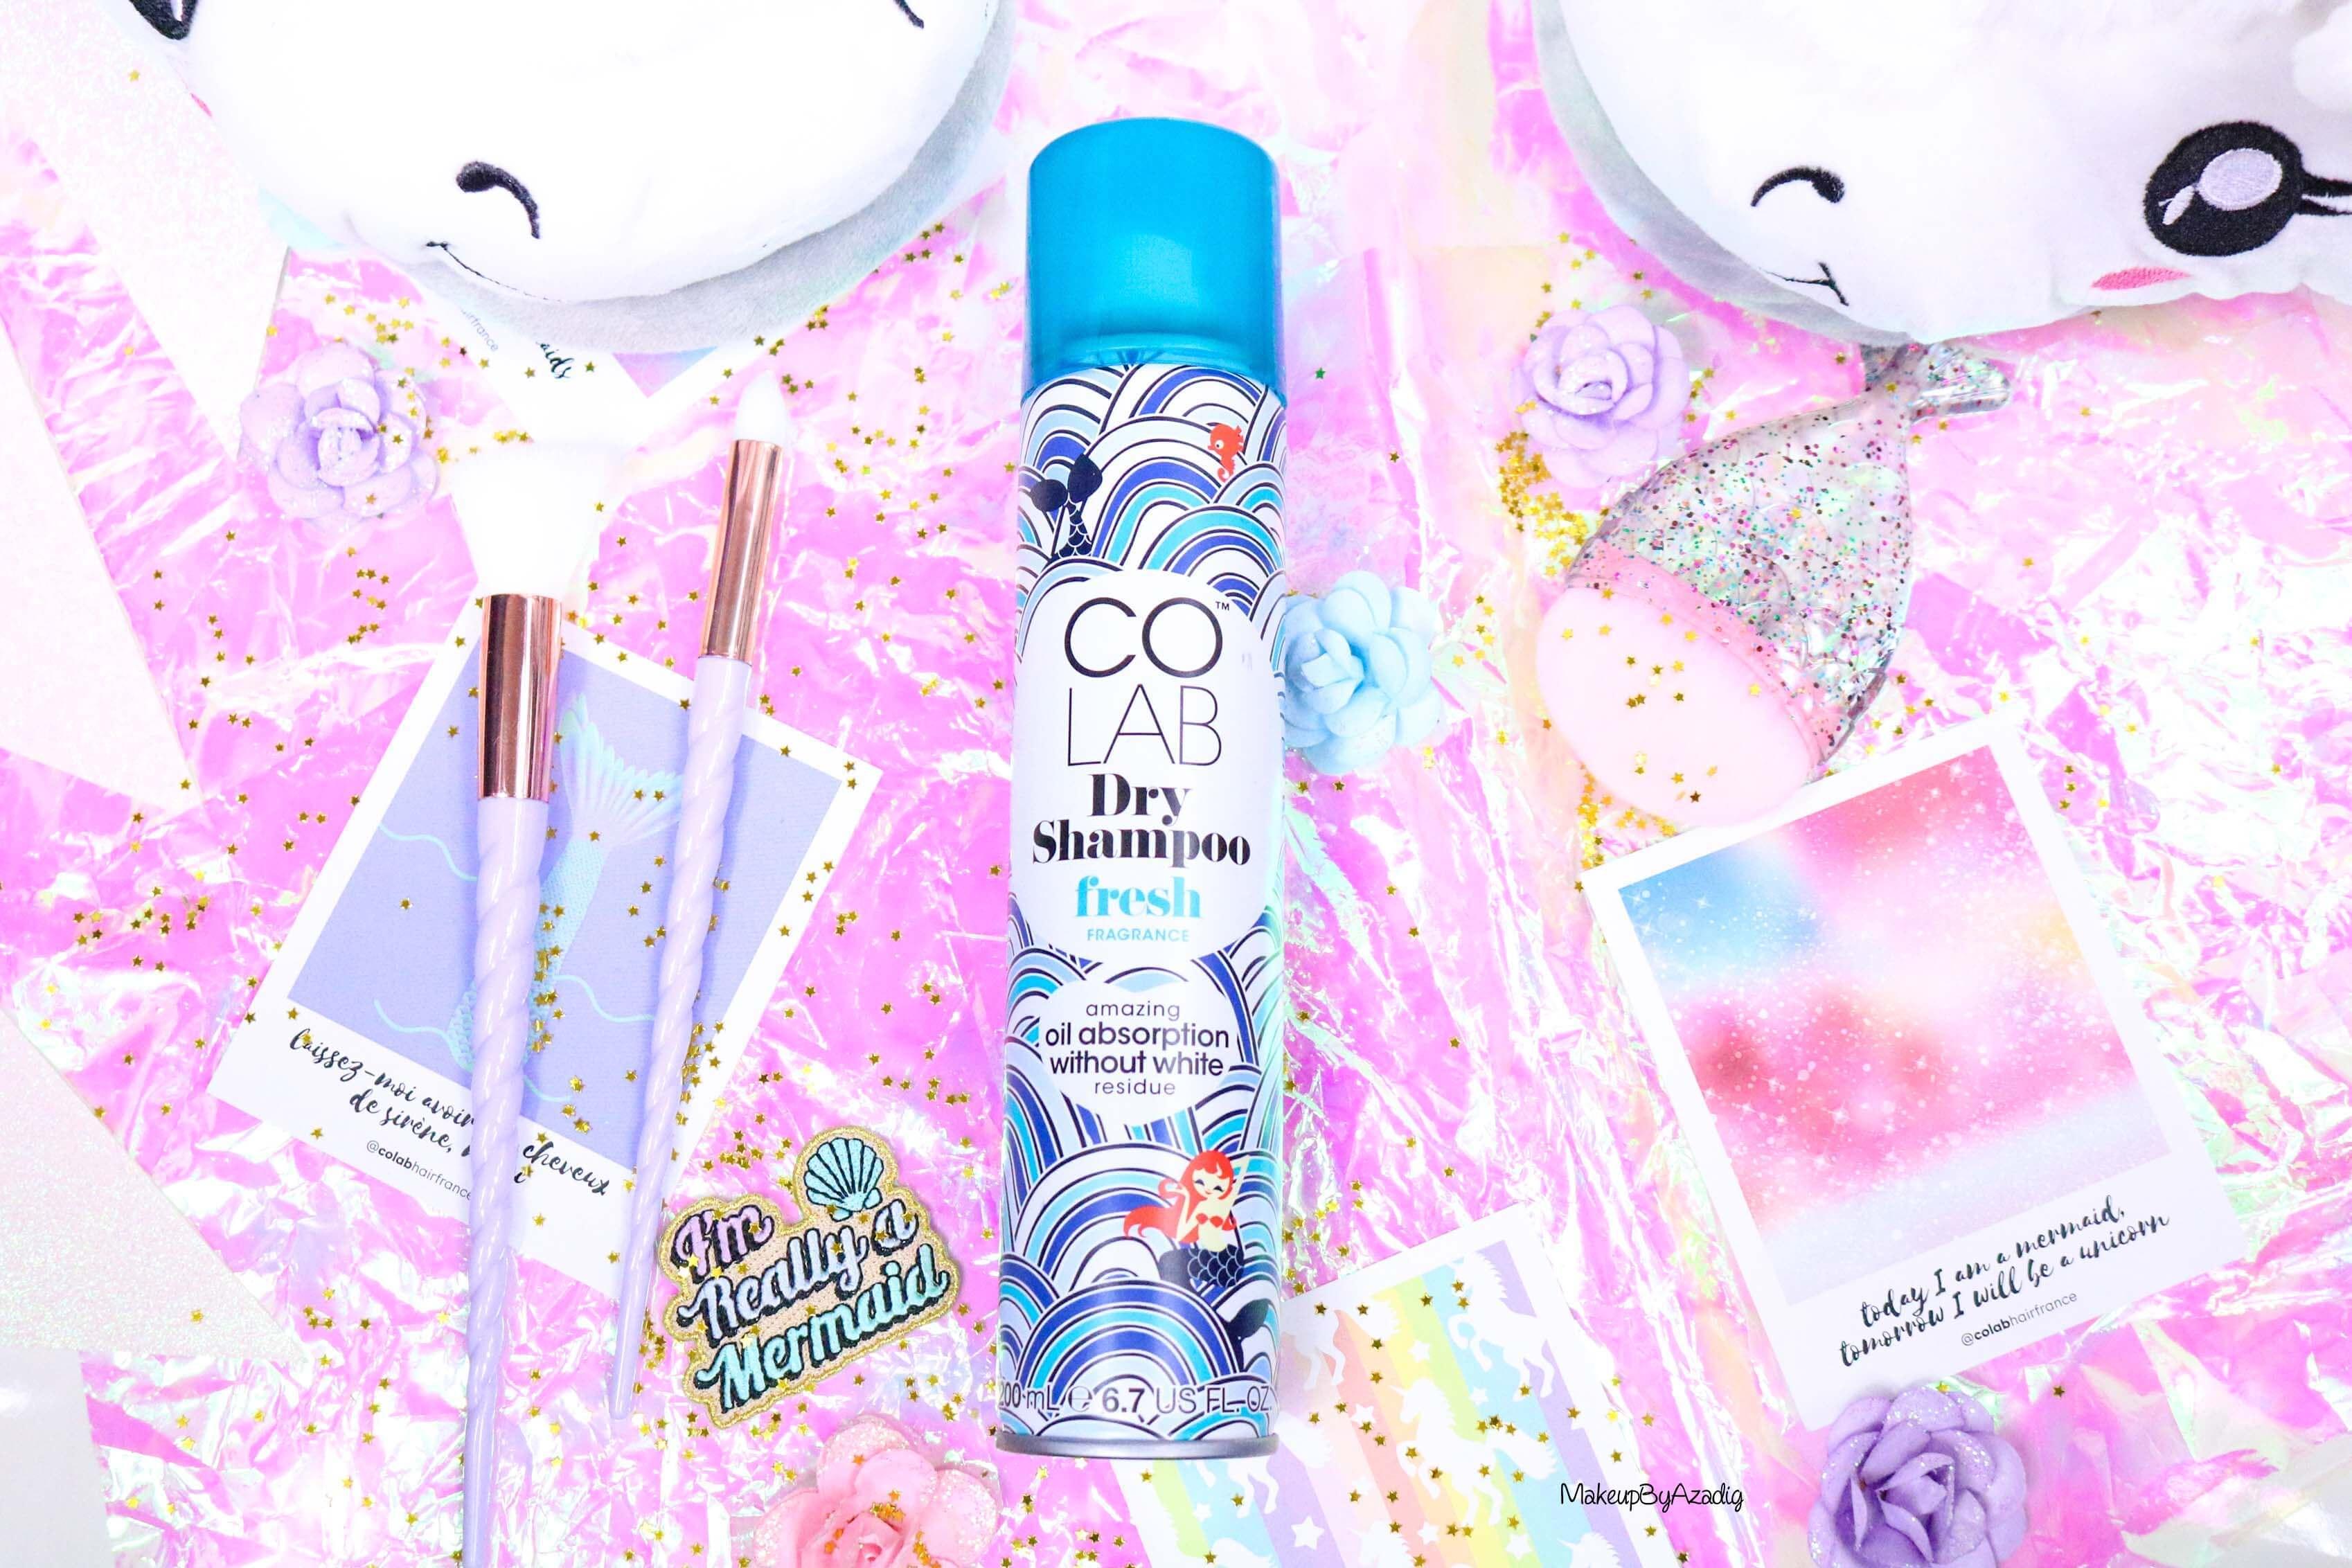 revue-shampooing-sec-colab-batiste-fresh-unicorn-monoprix-feelunique-prix-avis--soin-capillaire-efficacite-makeupbyazadig-fresh